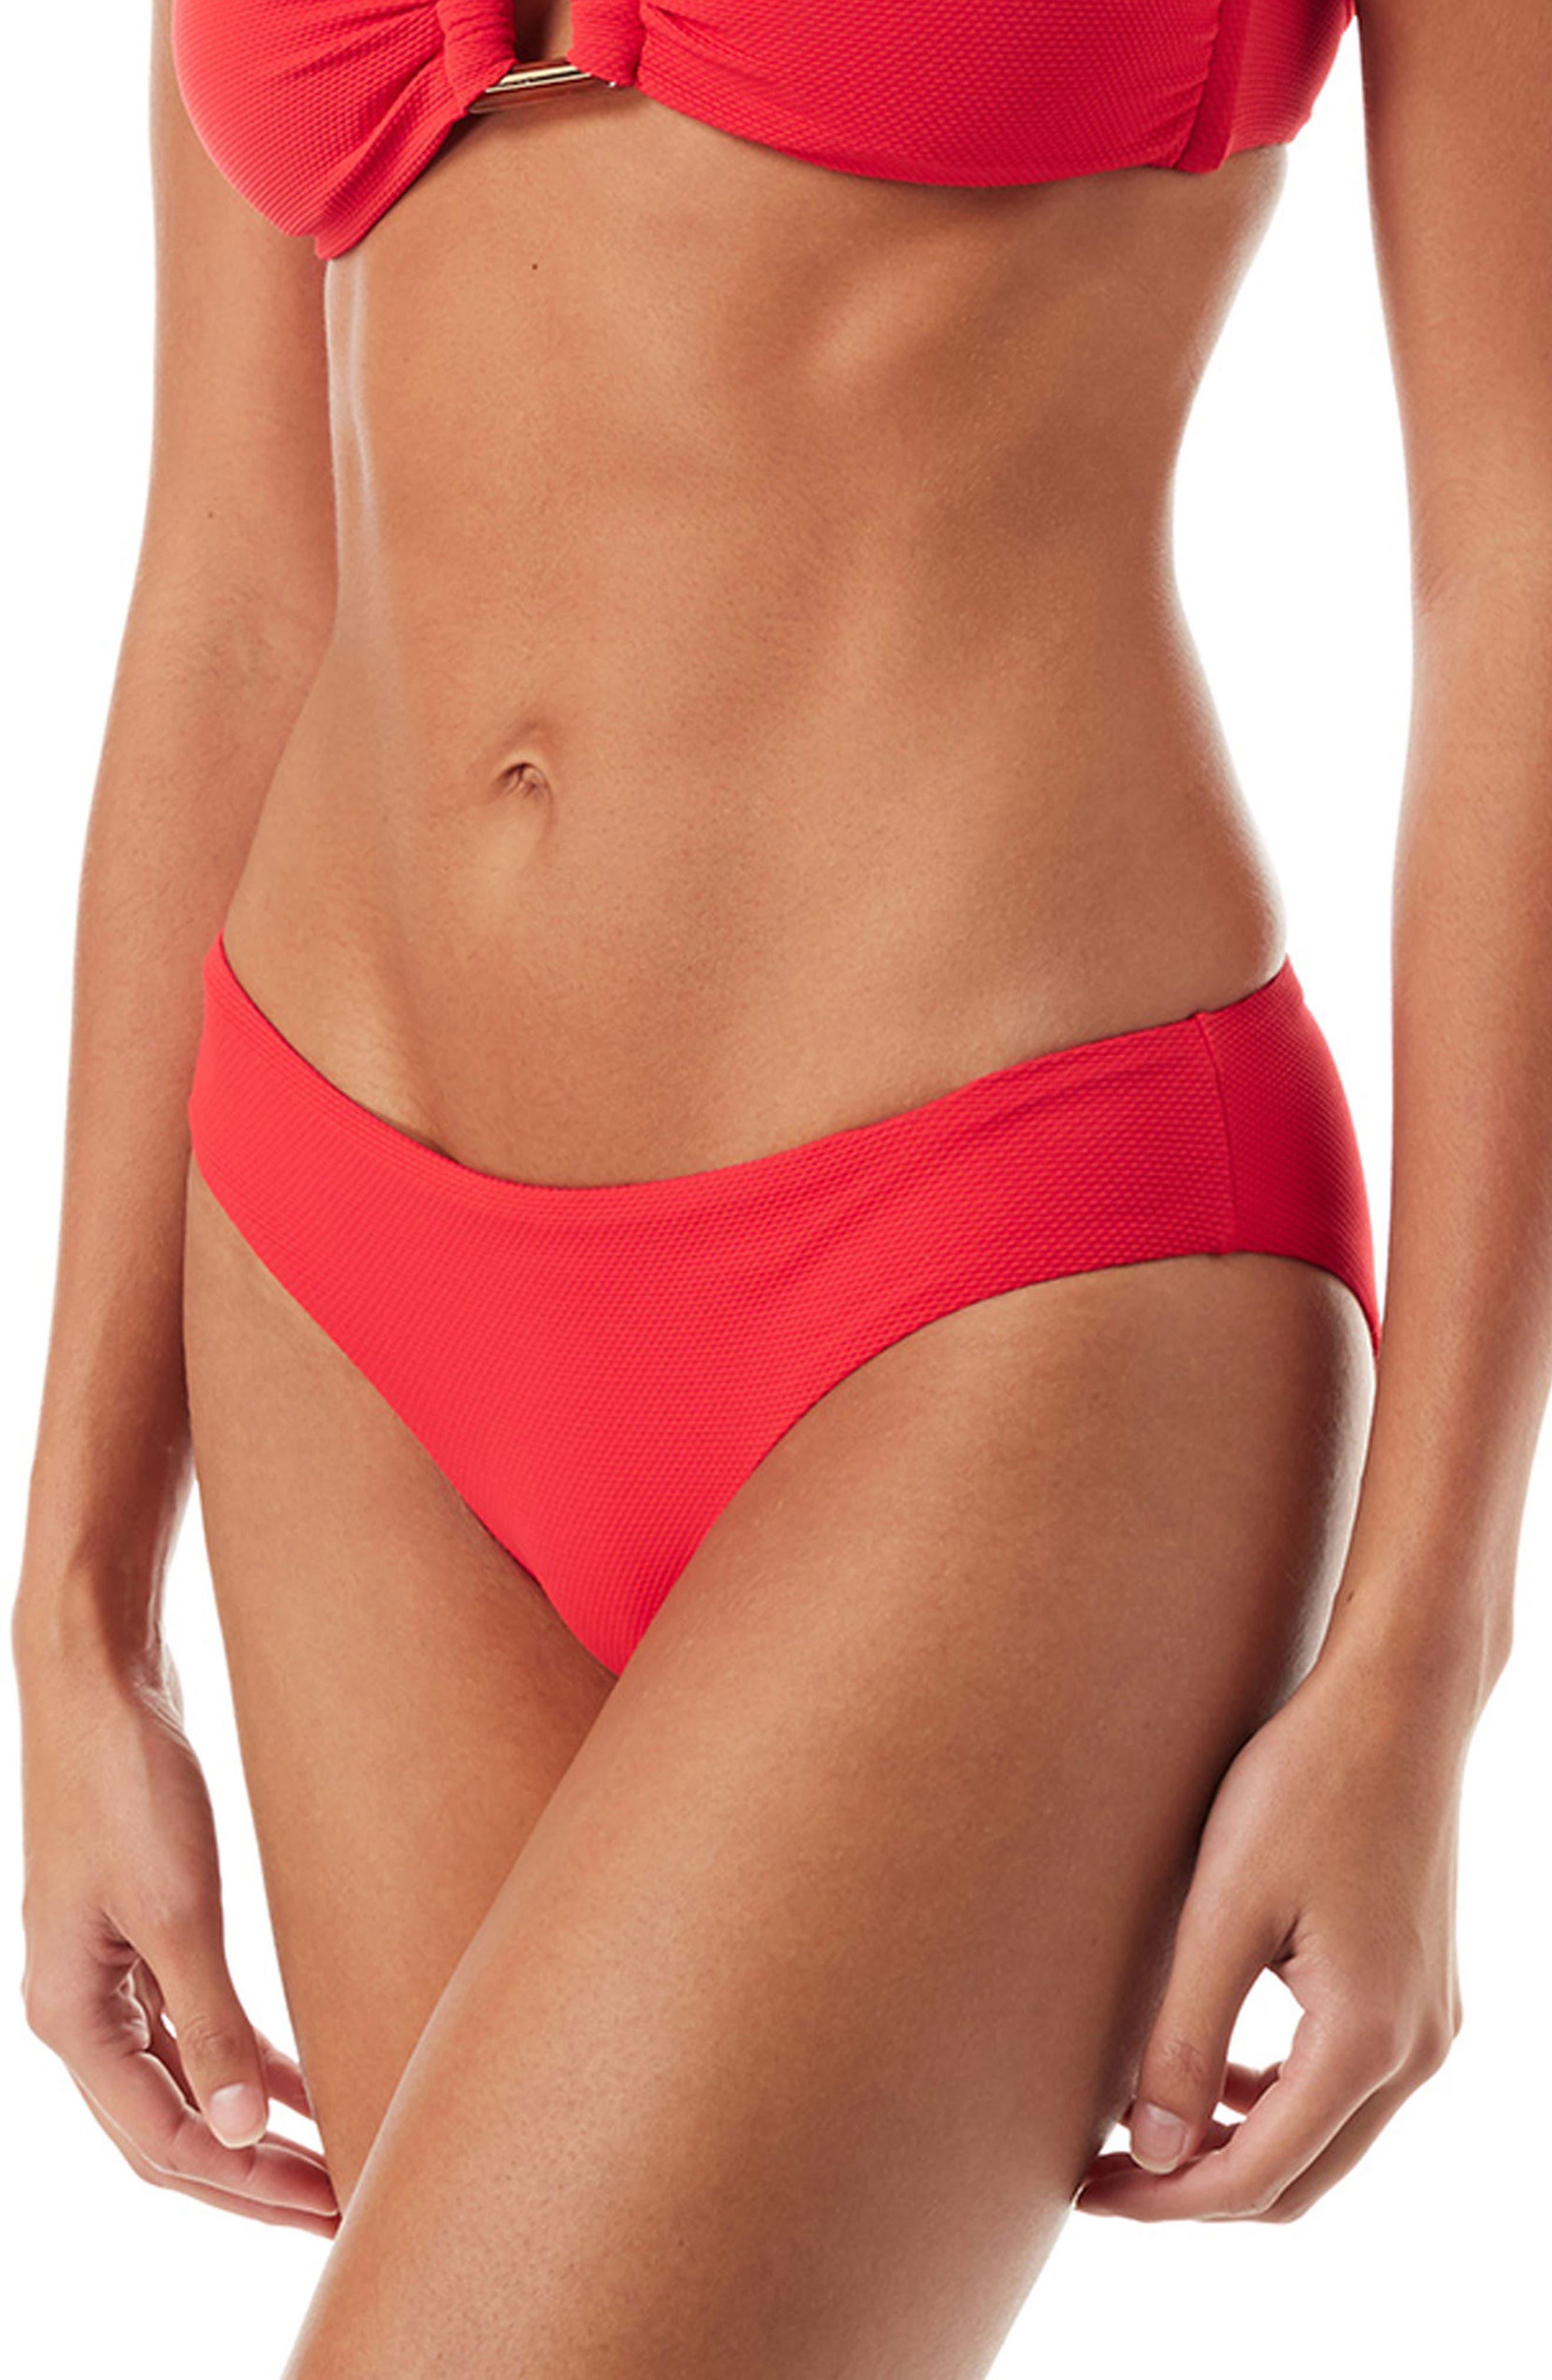 Angola Bikini Bottoms,                         Main,                         color, Pique Red